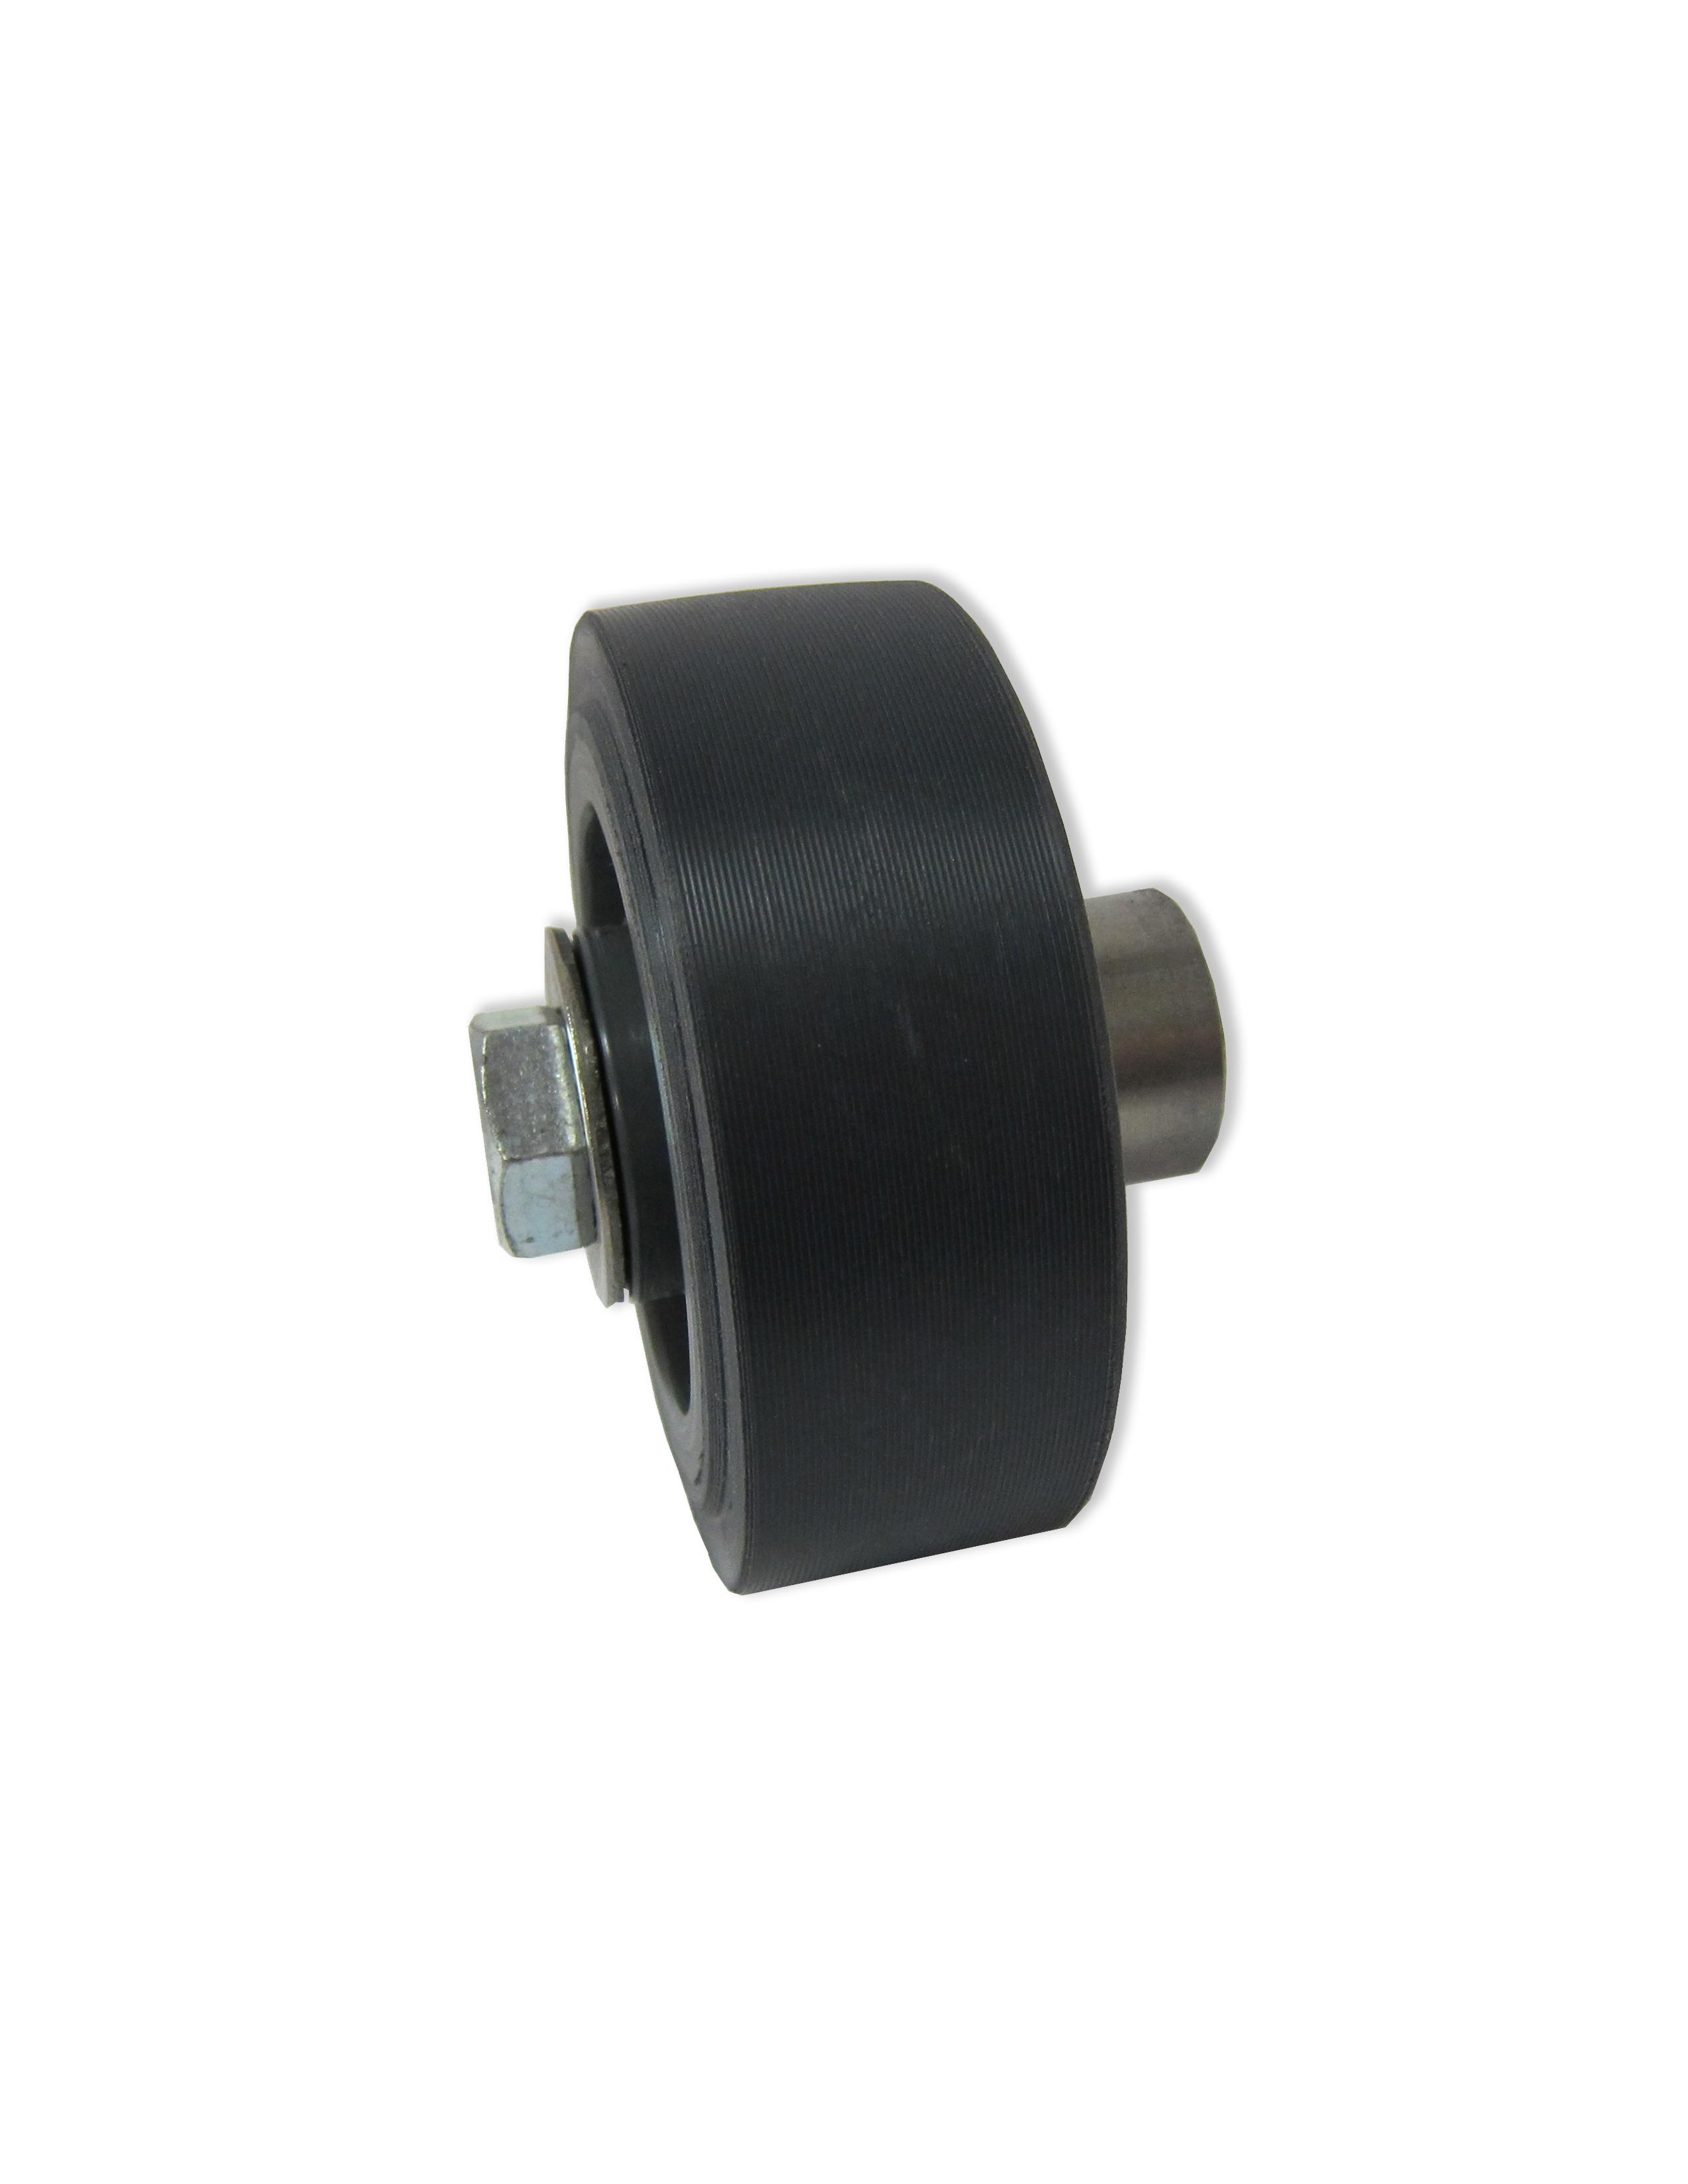 2 x 48 belt sander drive wheel, 936-007 2FSM 2 x 48 belt sander drive wheel